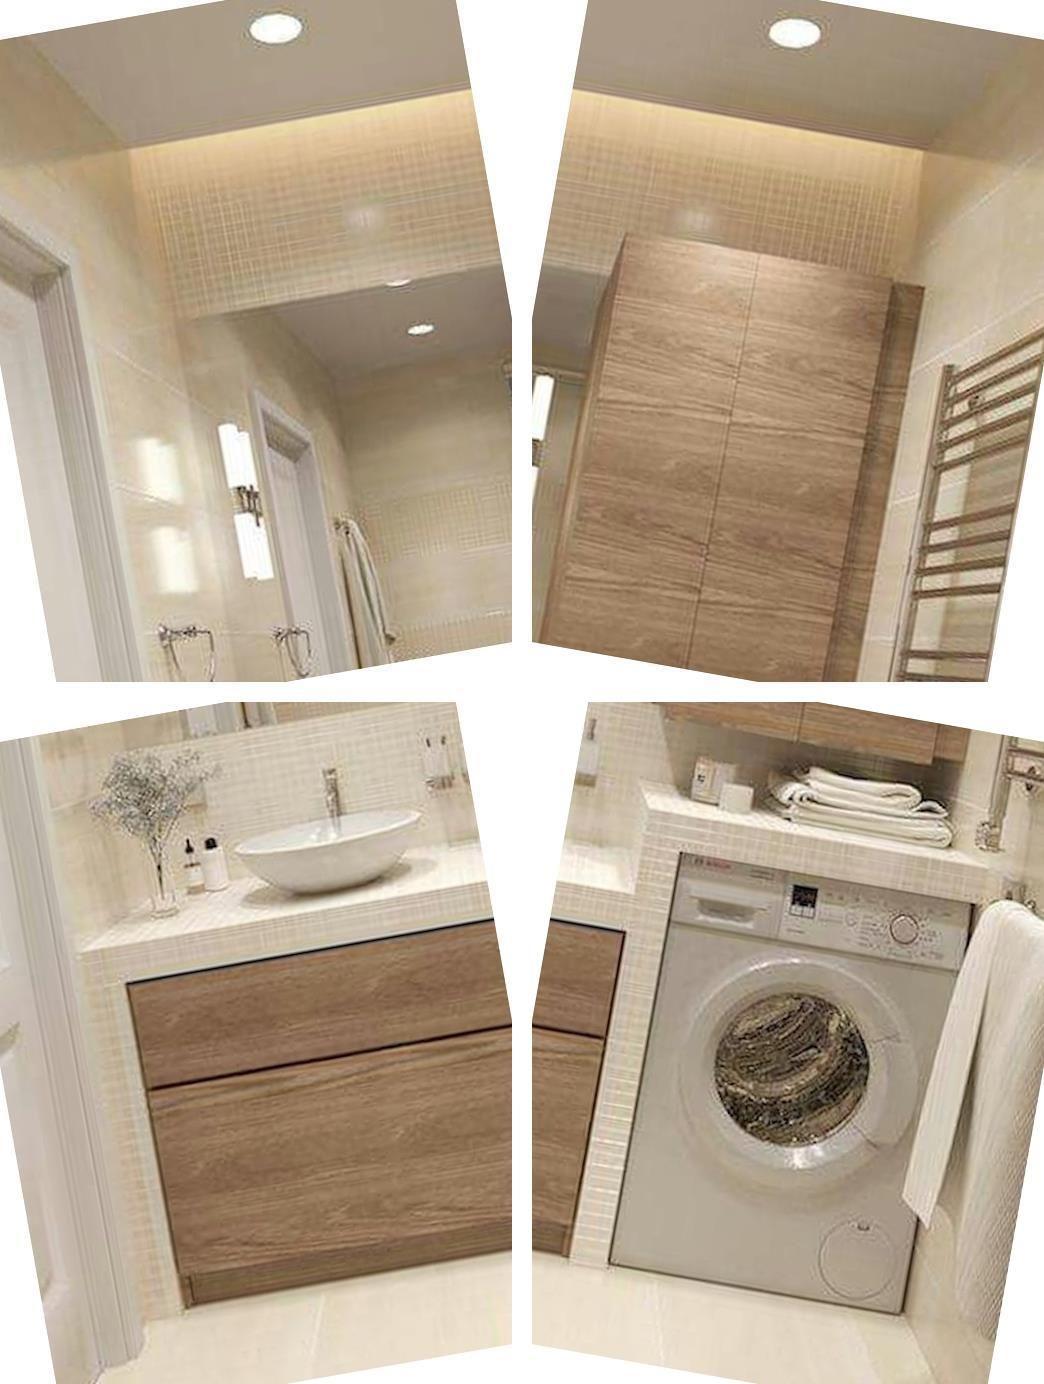 Bathroom Decoration Items Bathroom Accessory Kit Green And Grey Bathroom Accessories Bathroom Decor Fancy Bathroom Gray Bathroom Accessories